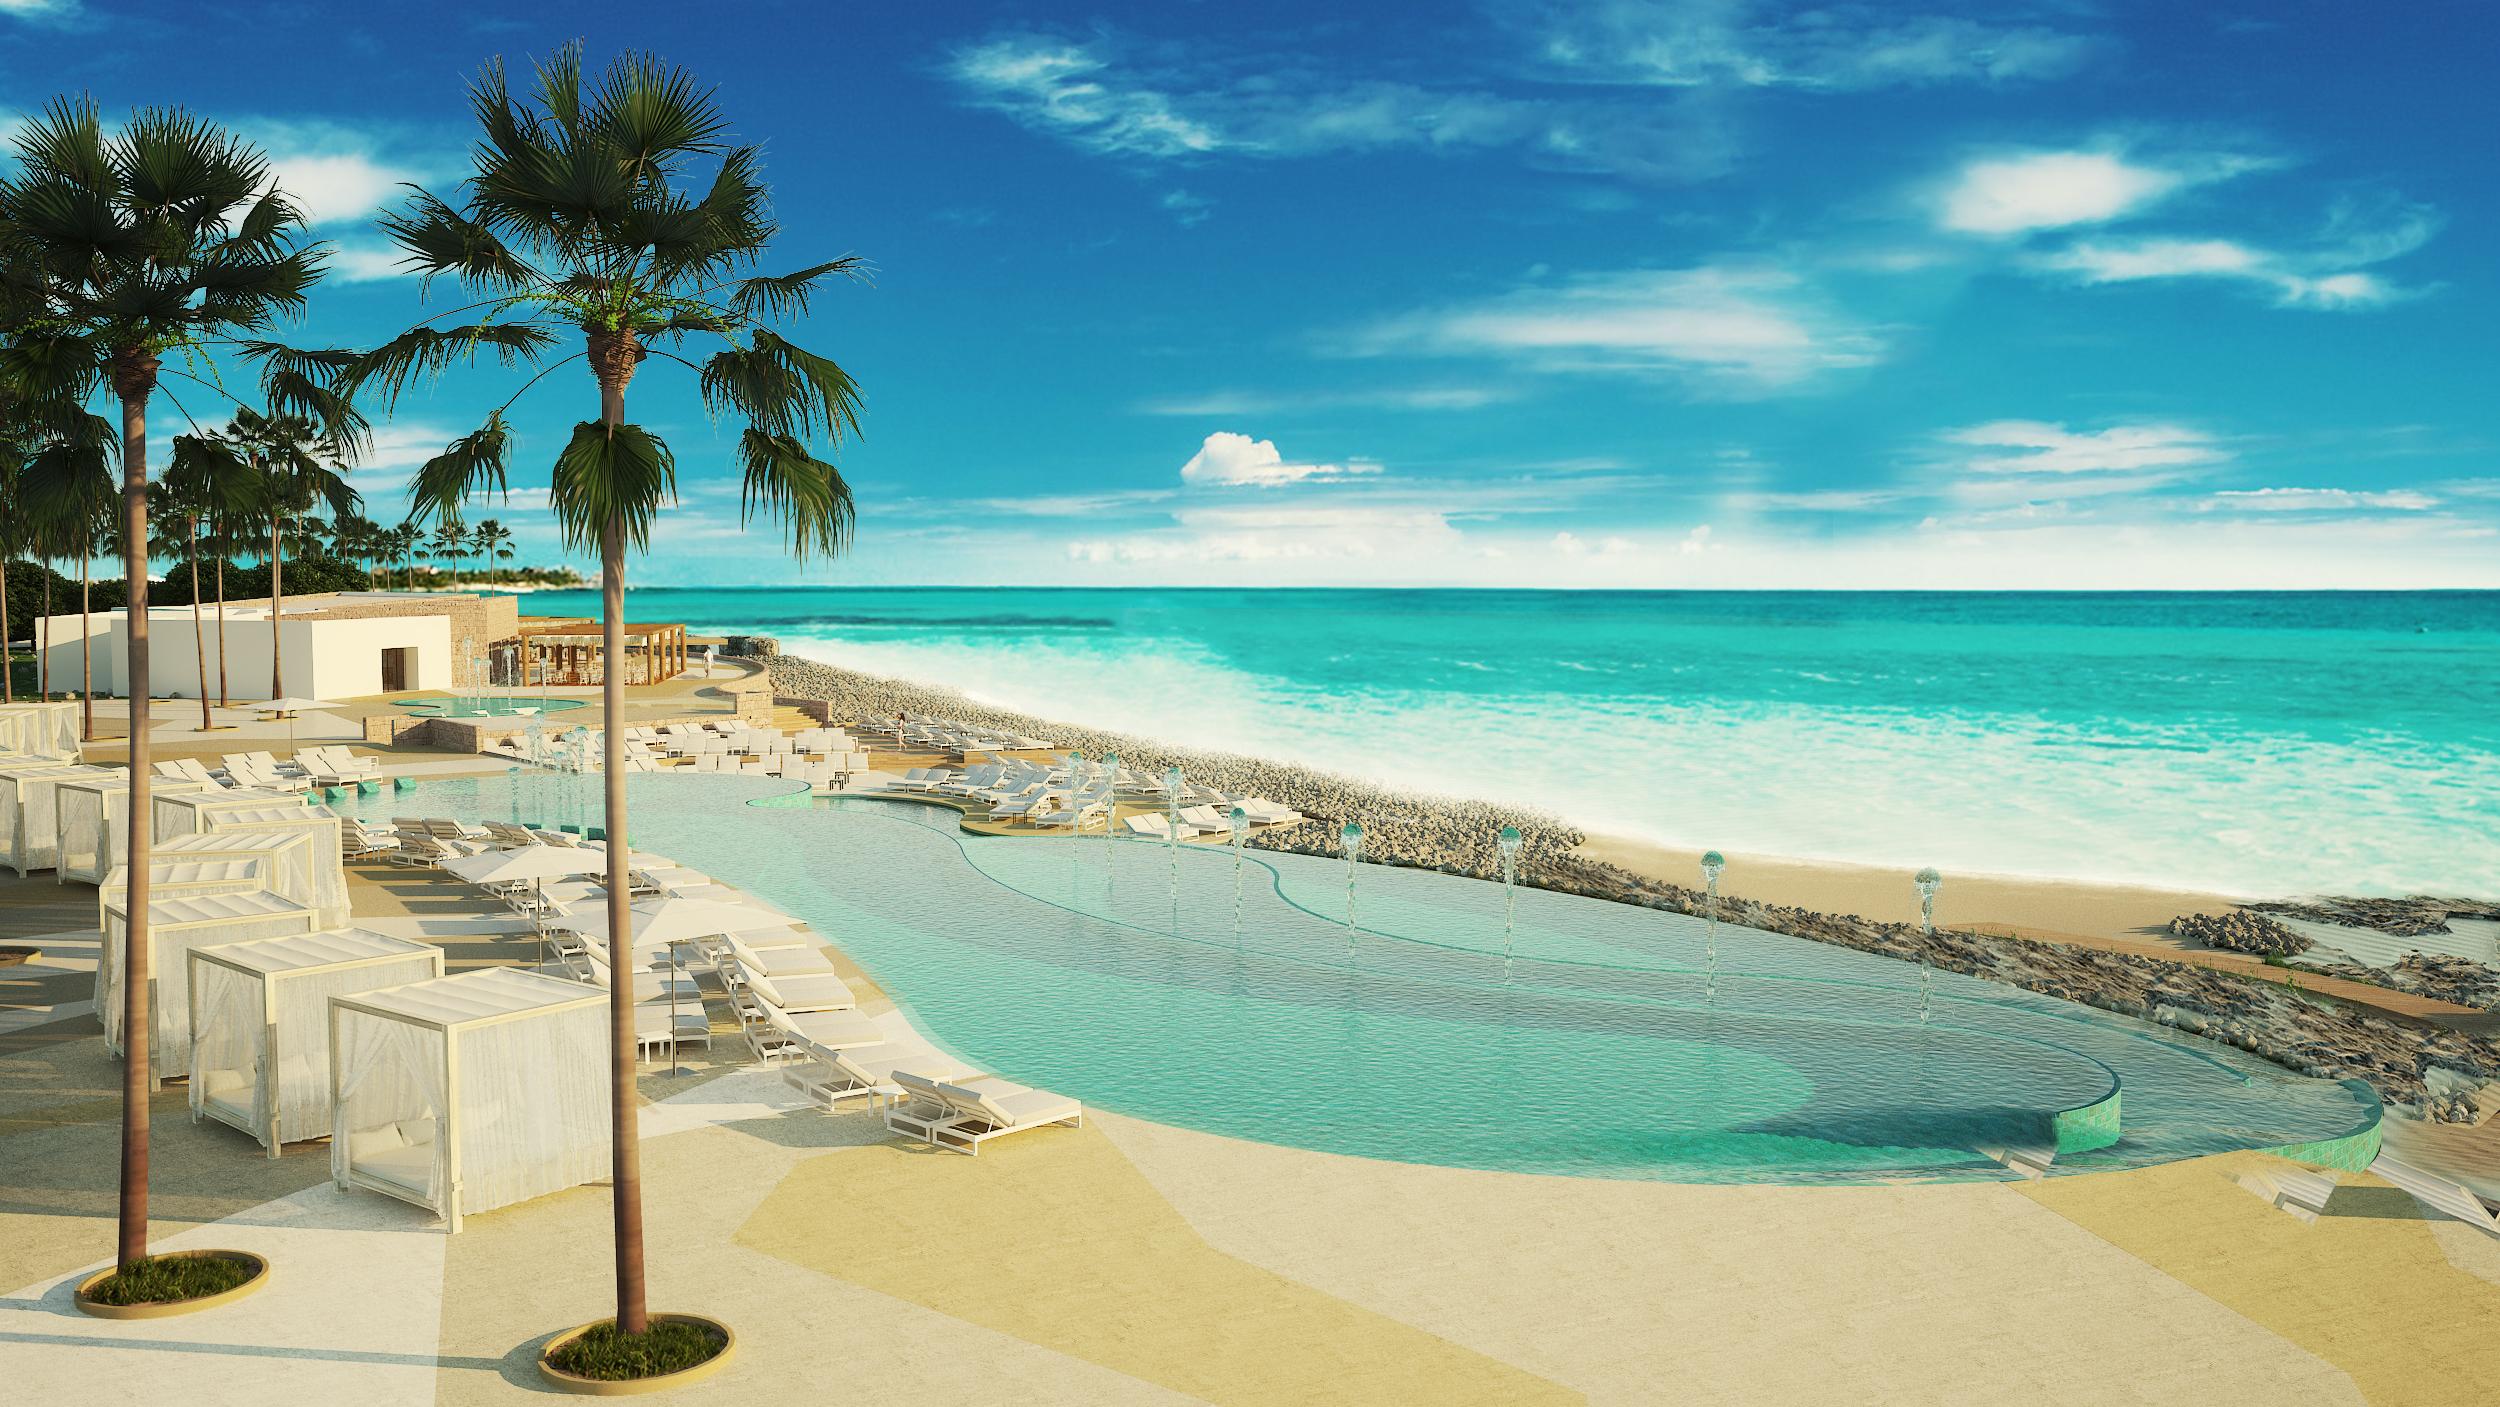 A rendering ofThe Royal Suites Yucatan Hotelin Riviera Maya.